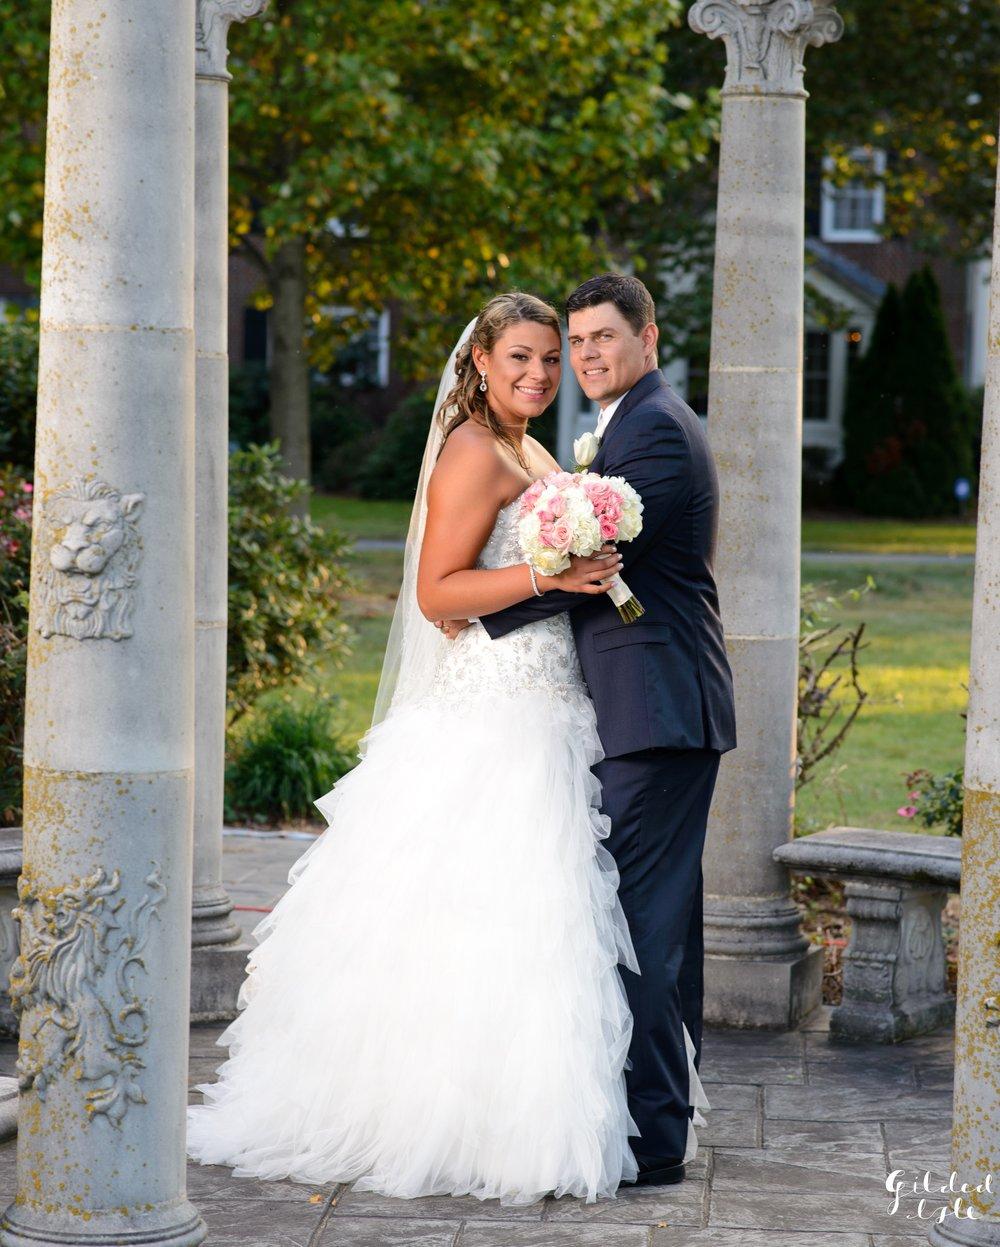 wedding-delaware-sunnybrae-mansion-salisbury-maryland-photo 29.jpg